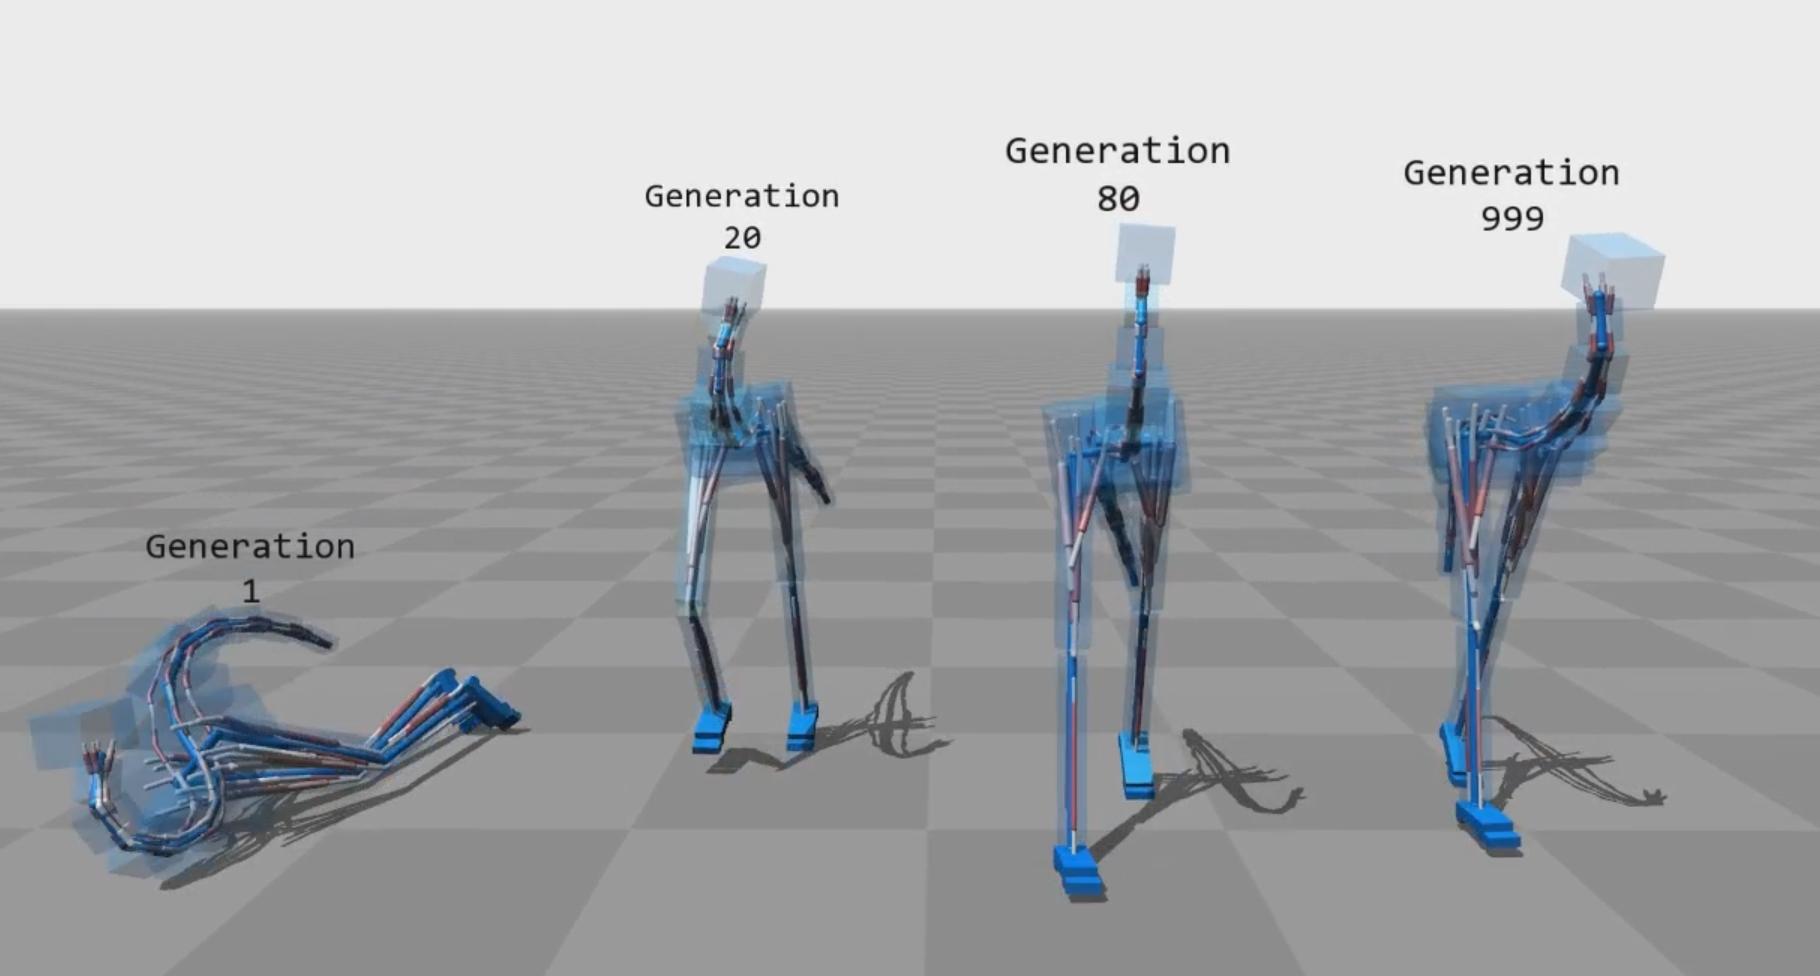 generation 999.jpg